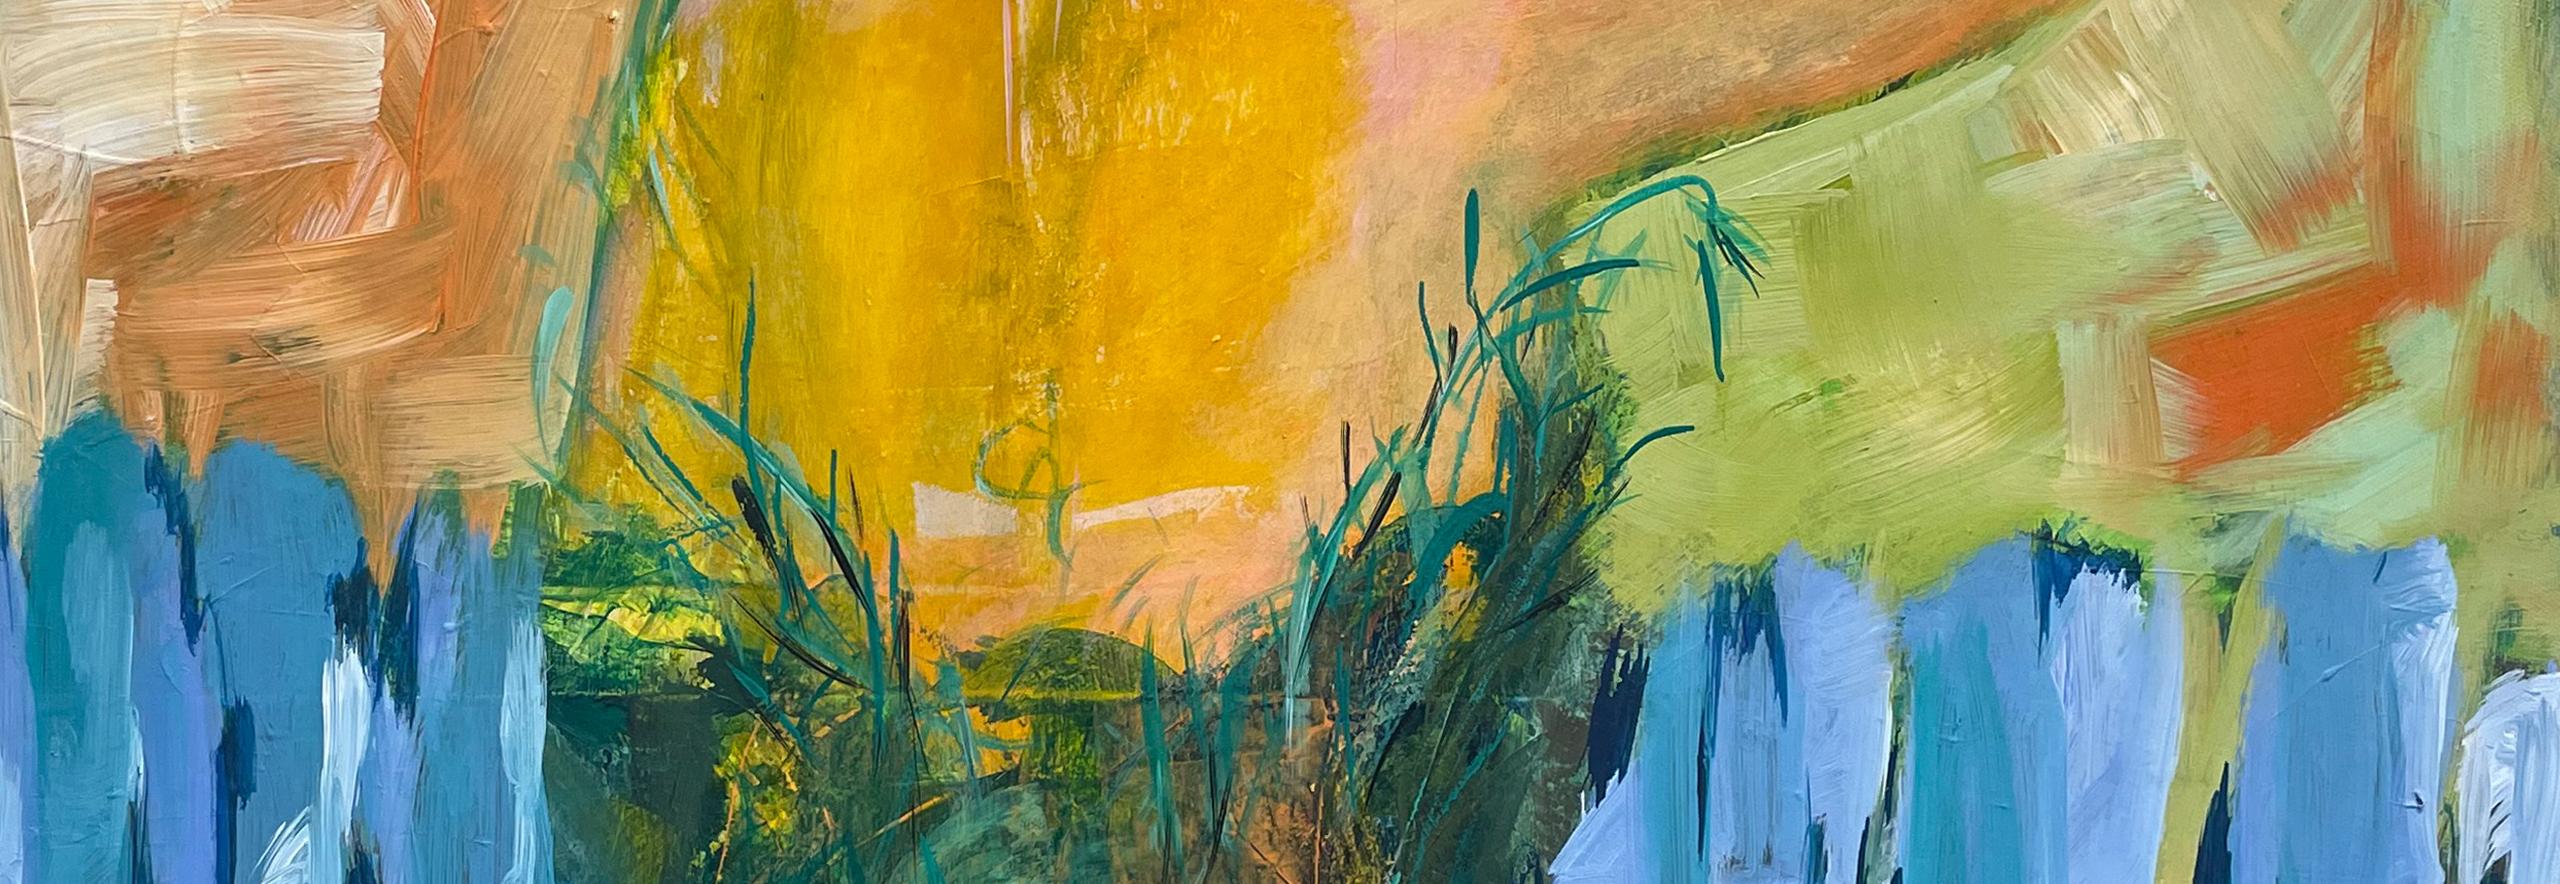 "Menschen / humans Sylvia Gatz. ""Ohne Titel (Baumfrau)"". Detail. 80 x 100 cm. Acryl auf Leinwand. 2020"